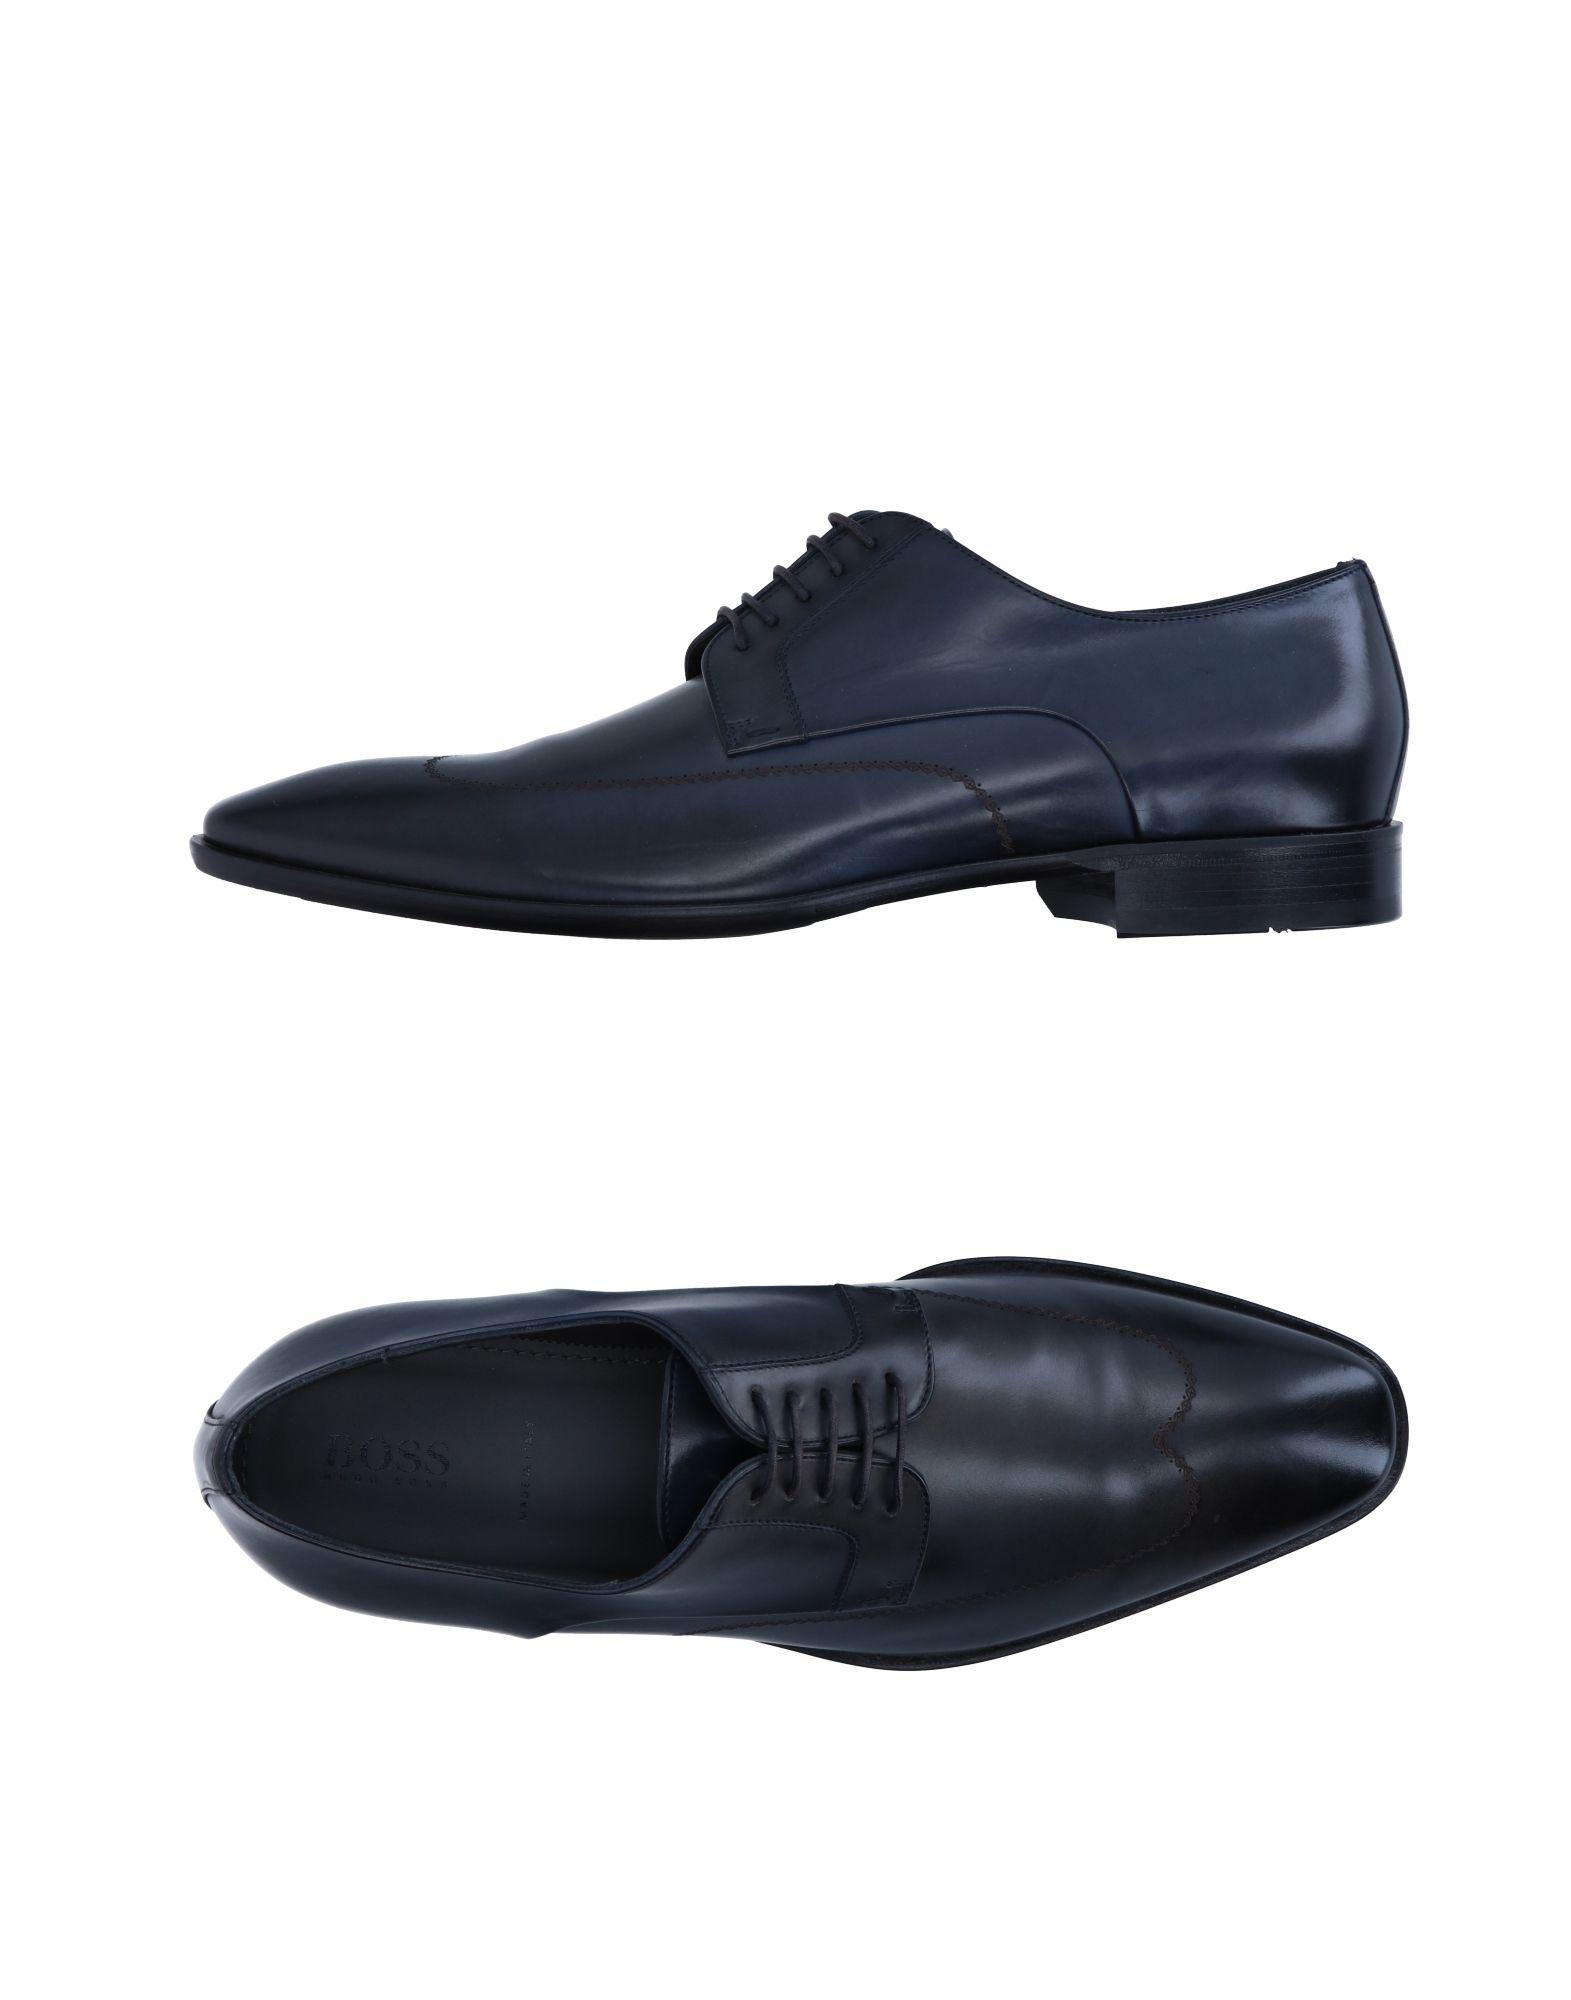 Boss Black Schnürschuhe Herren  11253727PA Neue Neue 11253727PA Schuhe 89ab19